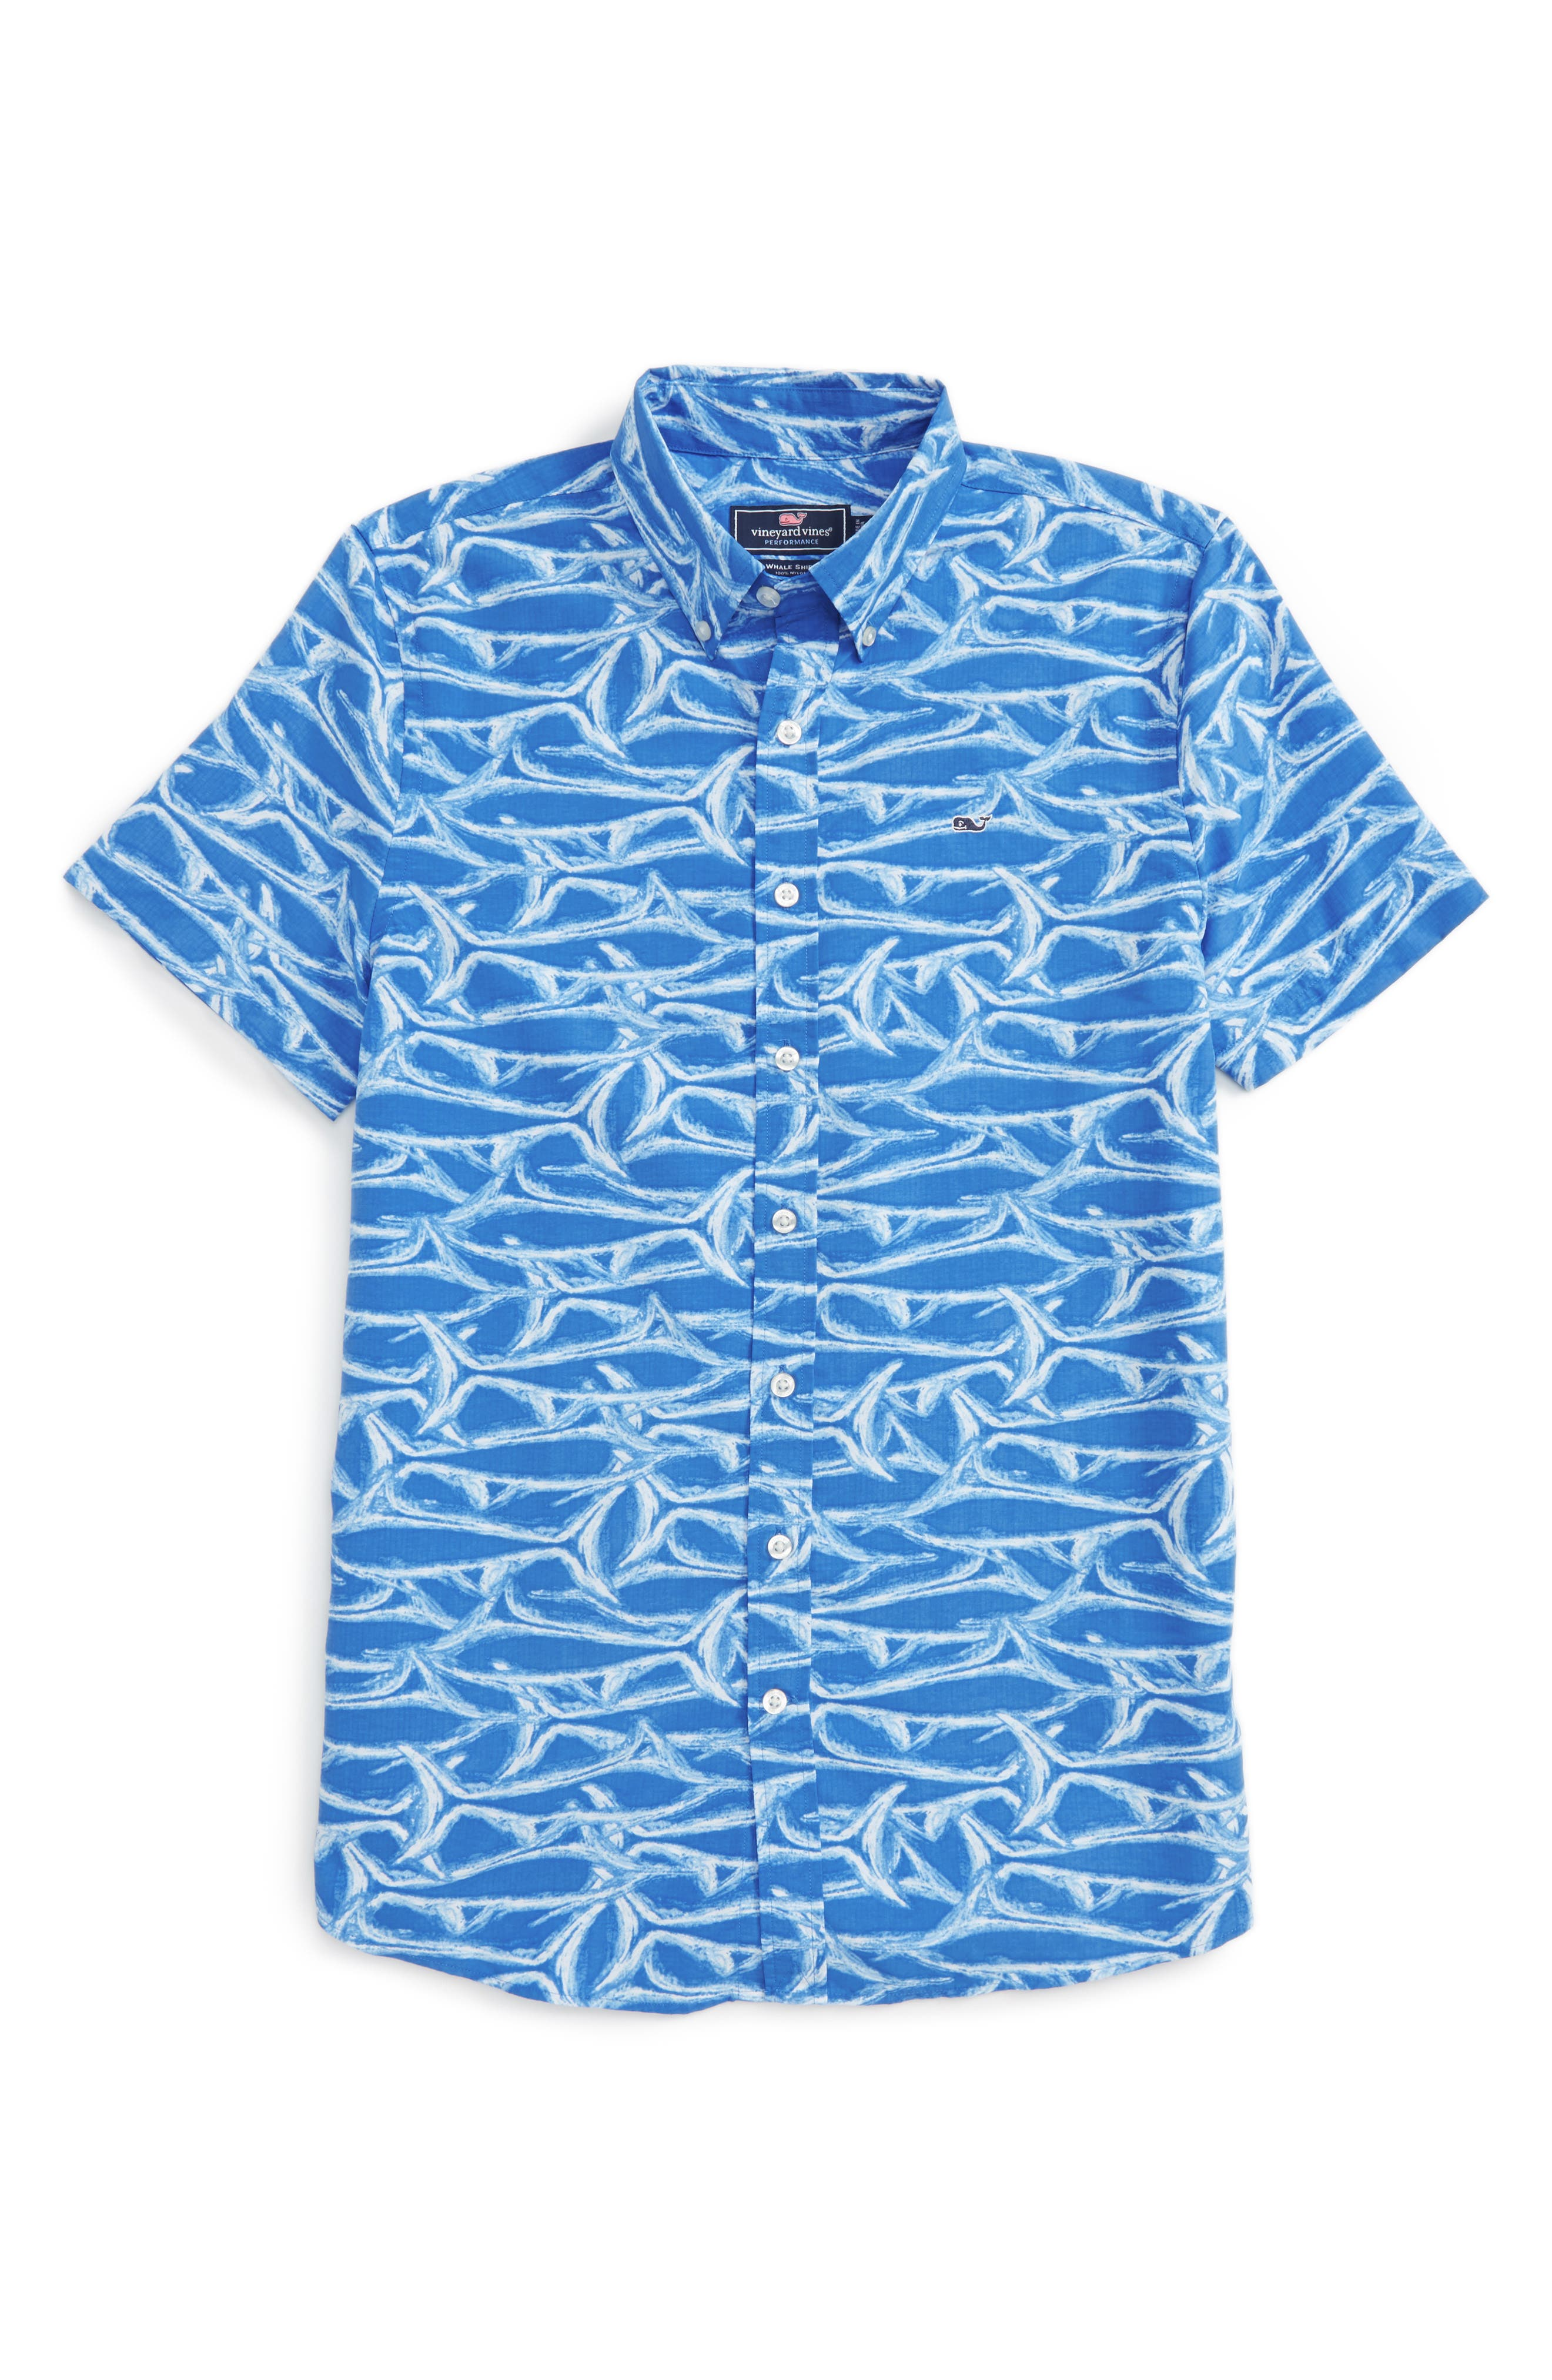 vineyard vines Brushed Marlin Whale Shirt (Big Boys)